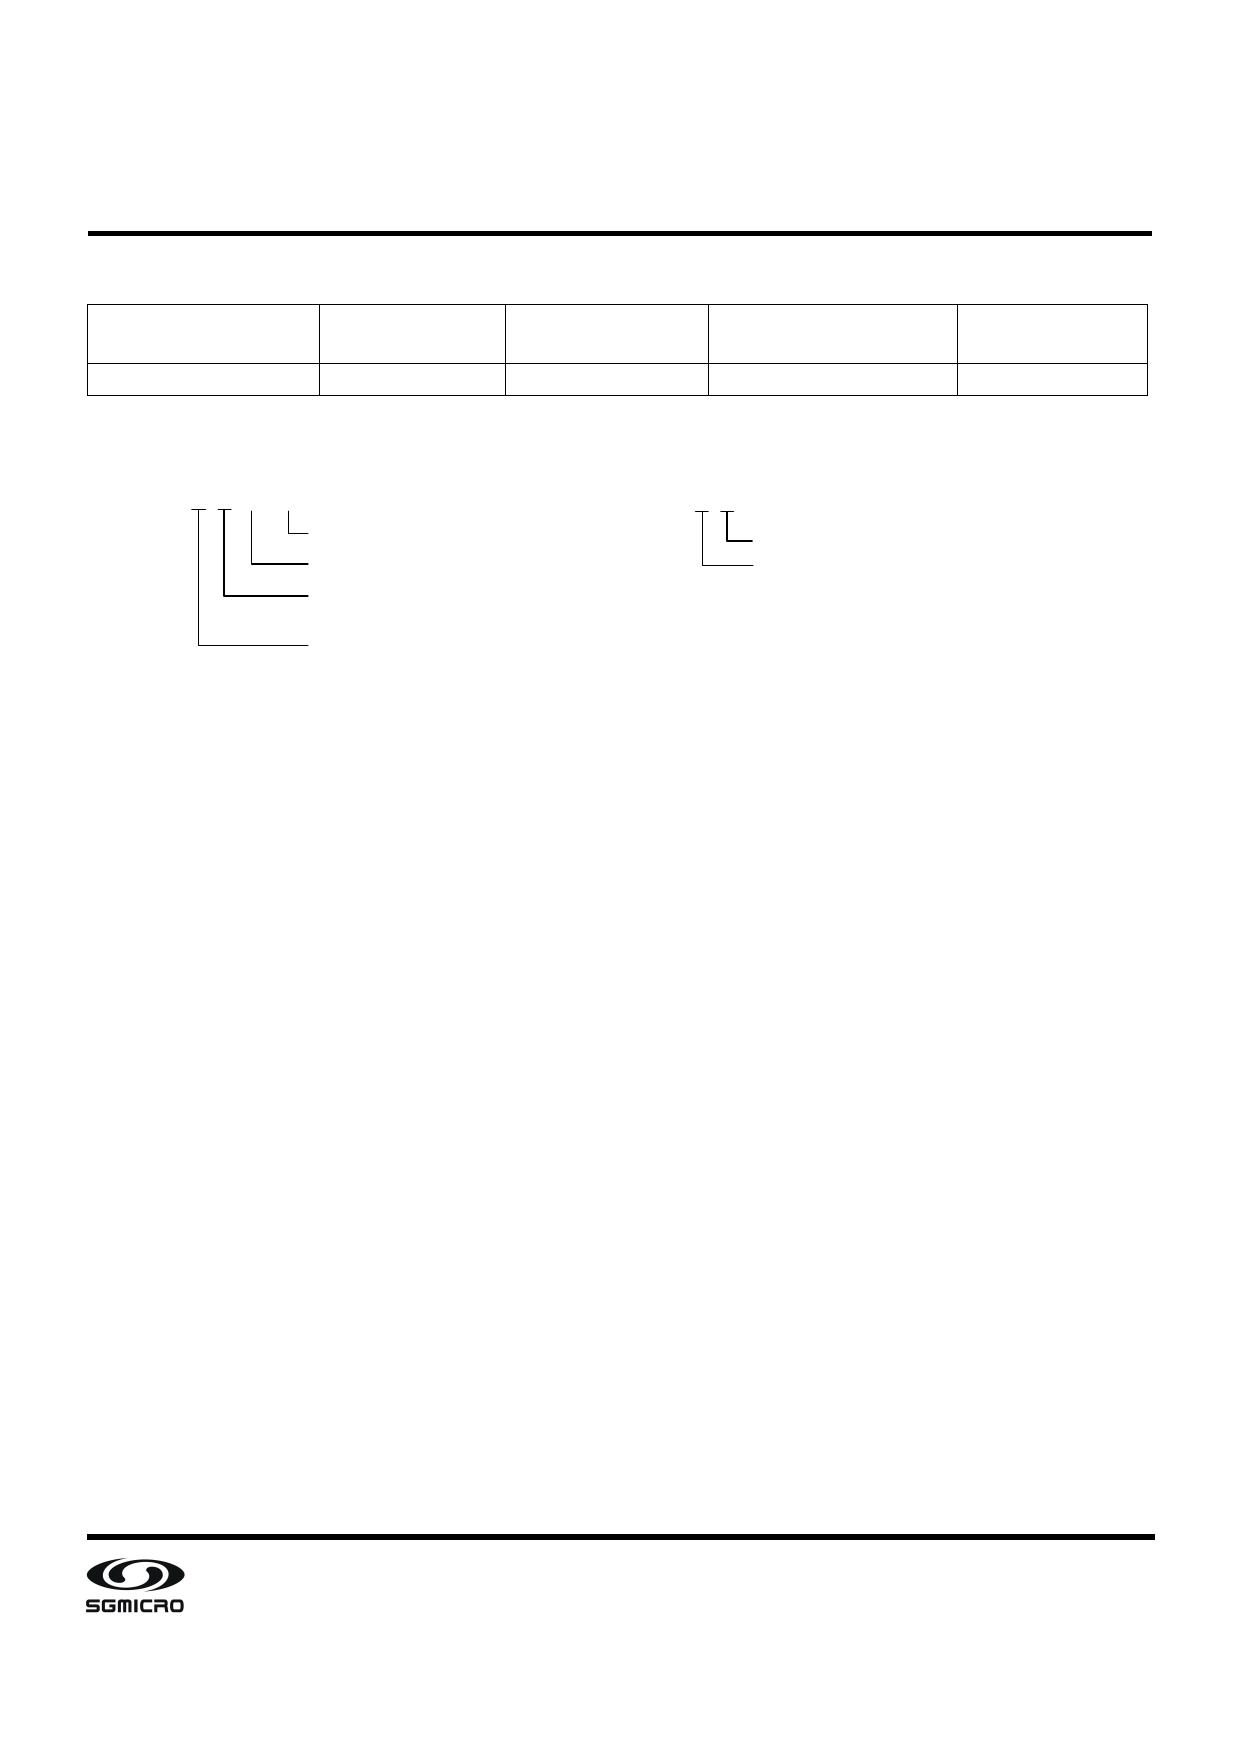 SGM9121 pdf, schematic